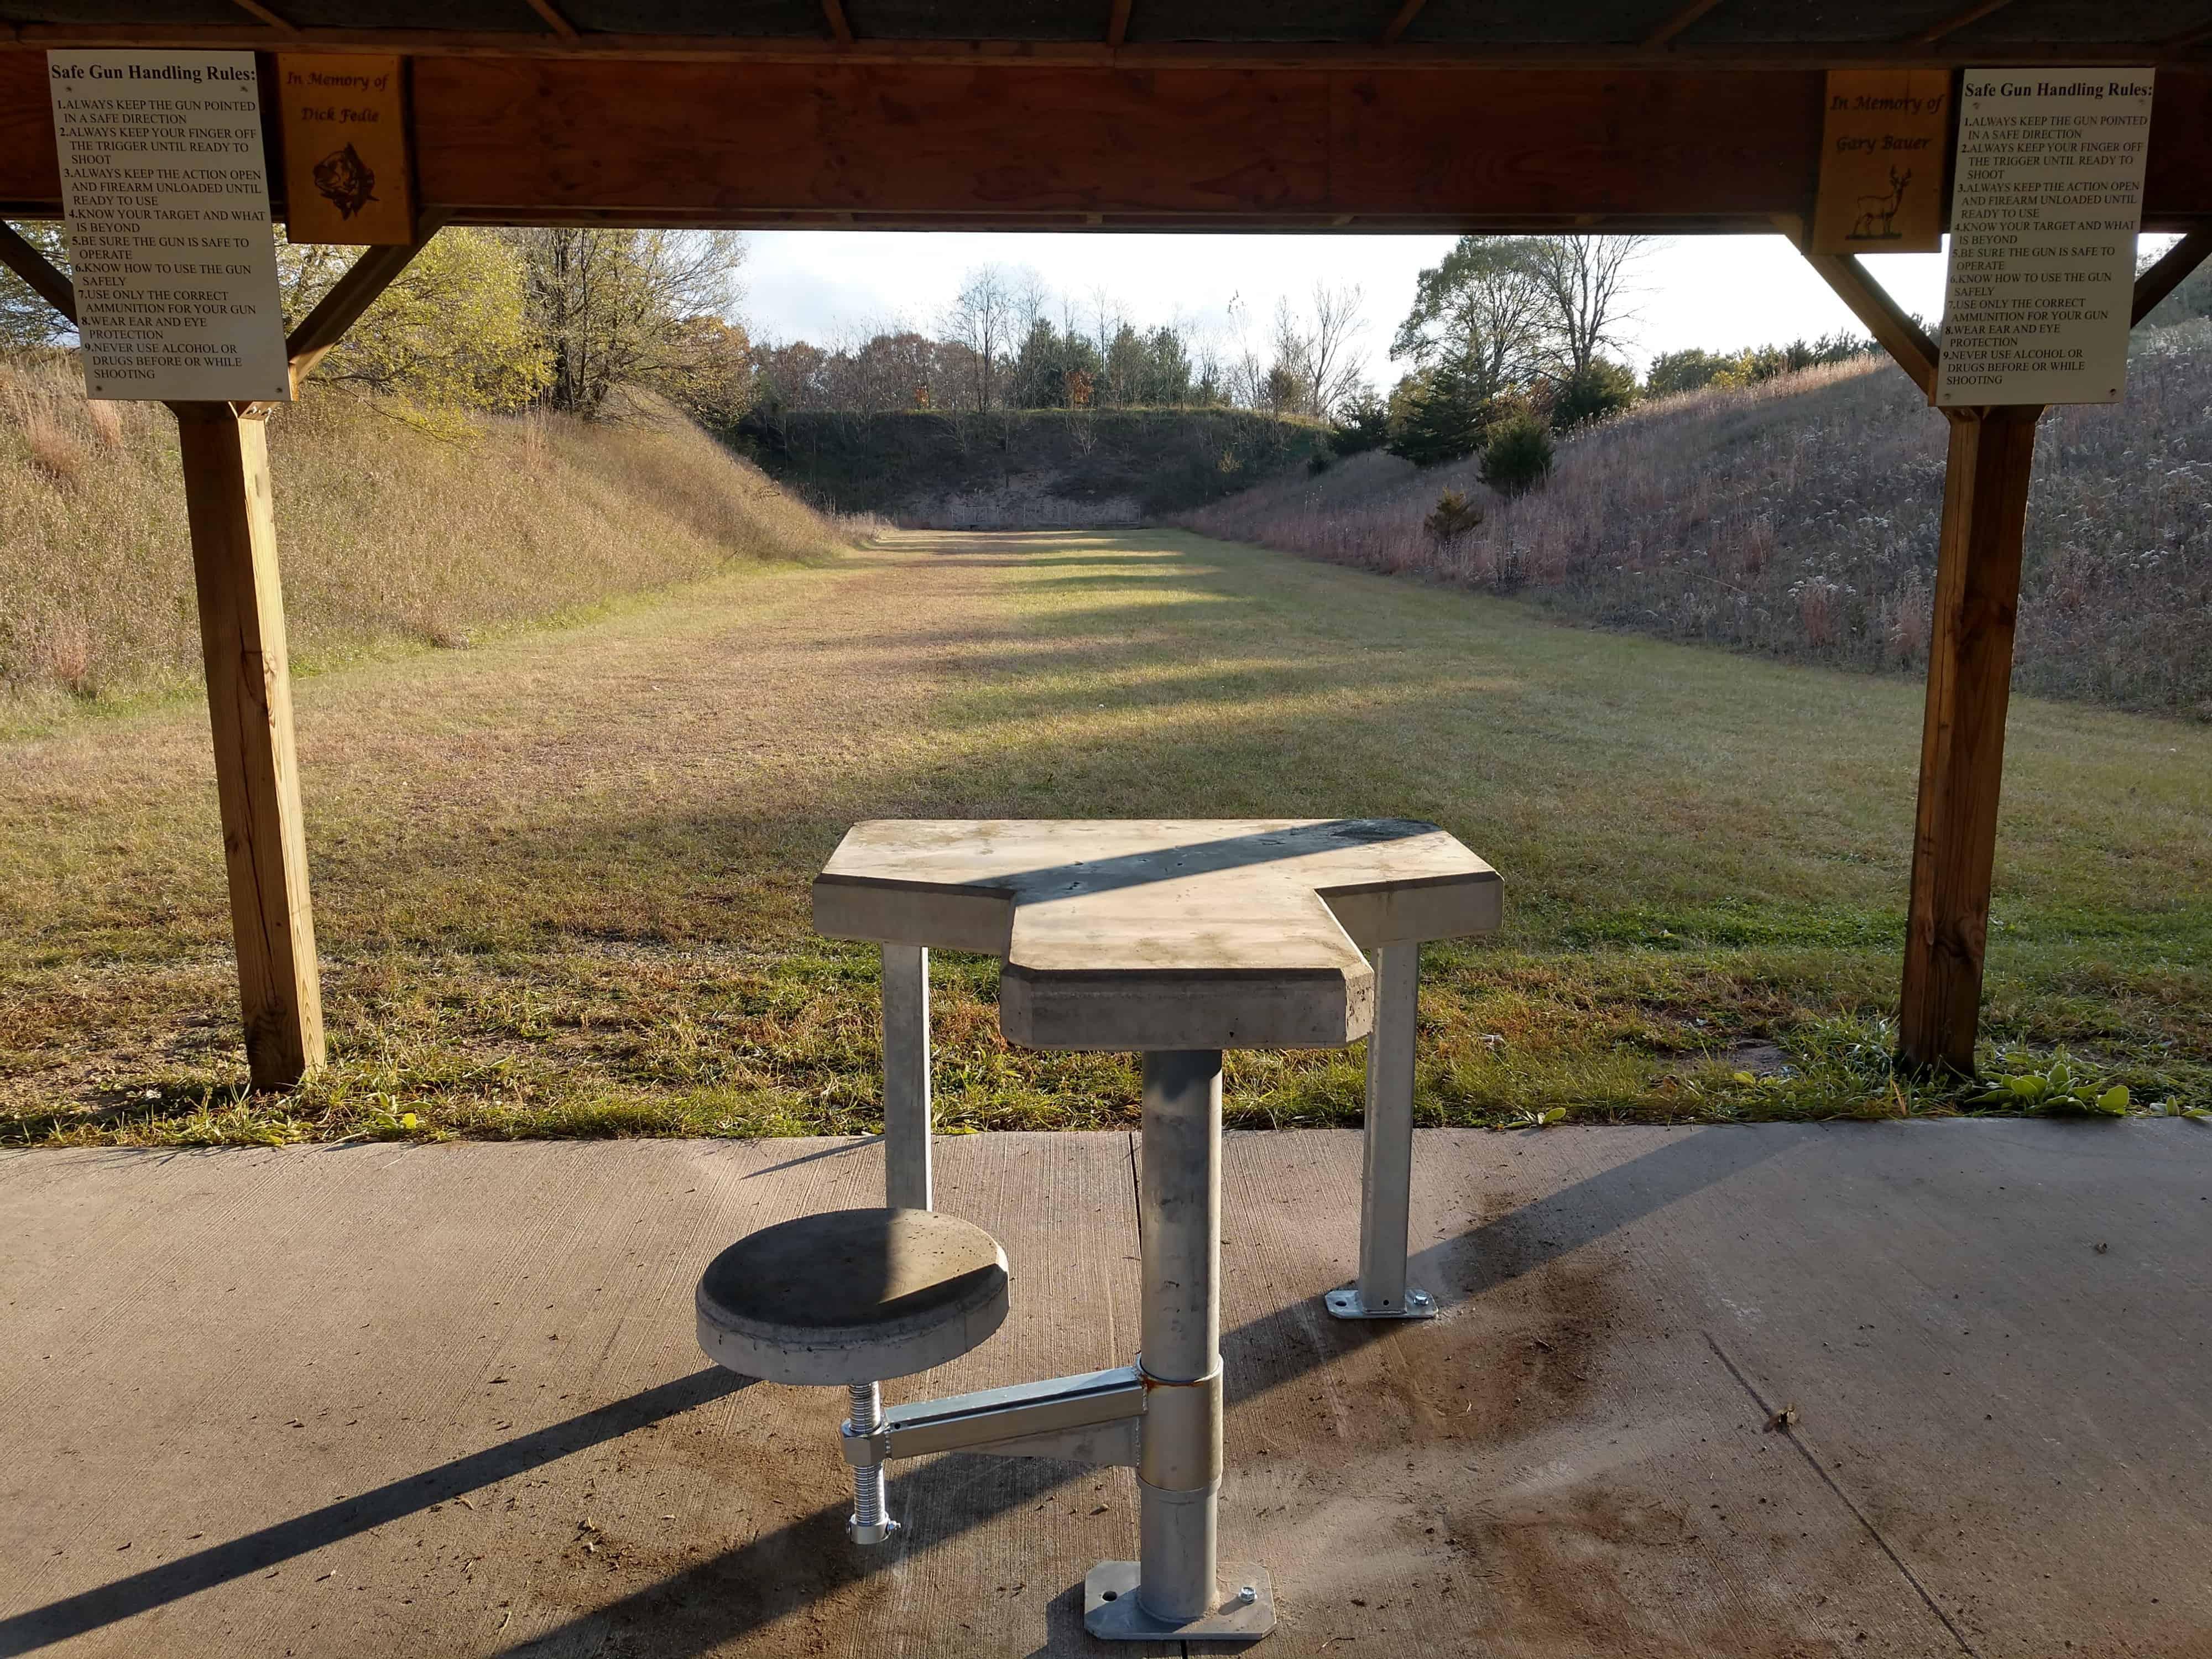 Precast Concrete Shooting Range Bench by Wieser Concrete